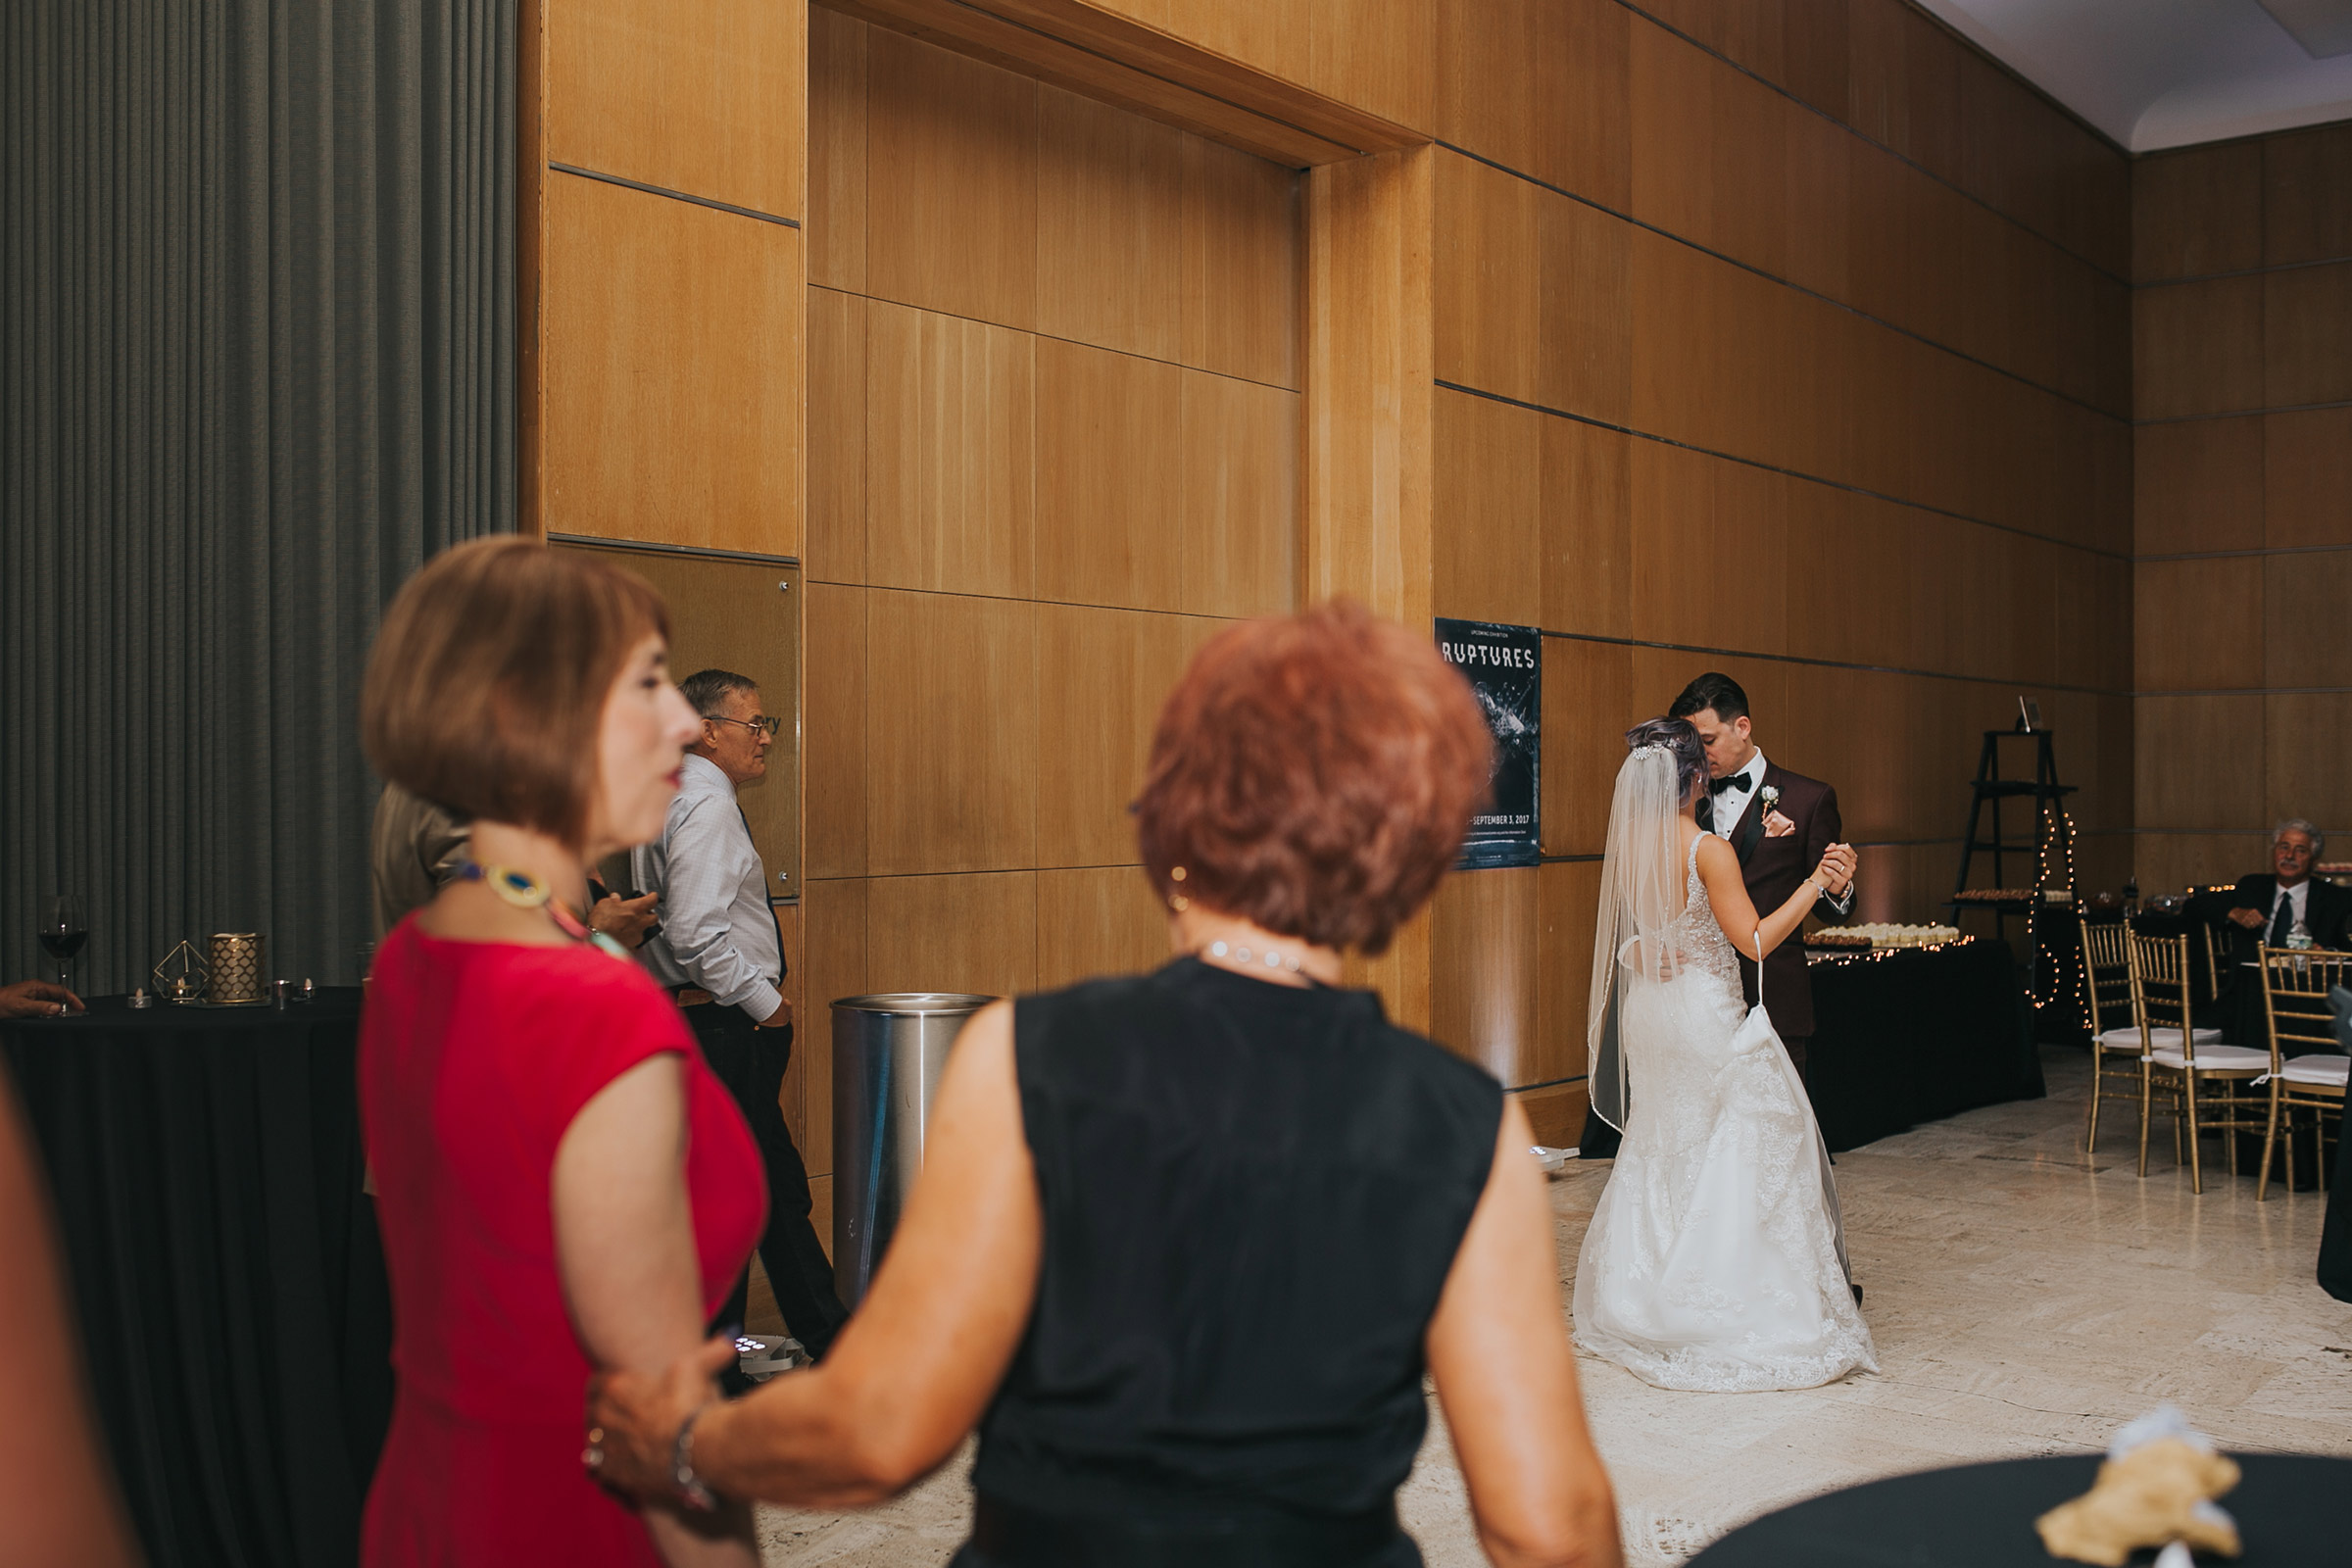 bride-and-groom-slow-first-dance-desmoines-iowa-art-center-raelyn-ramey-photography.jpg